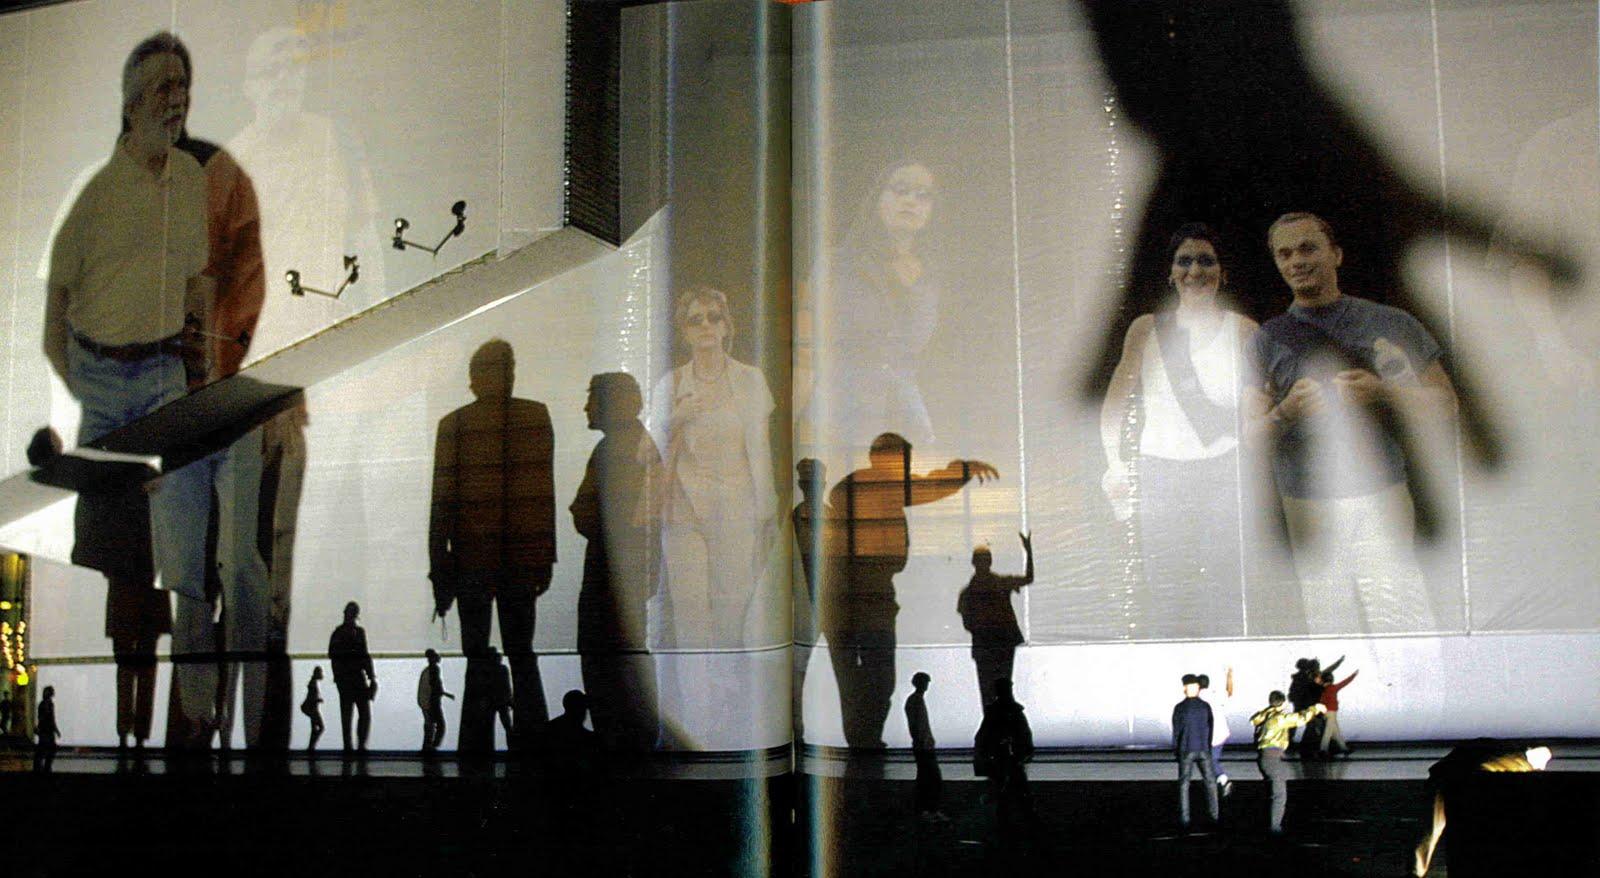 Rafael-Lozano-Hemmer.-Body-Movies-2001